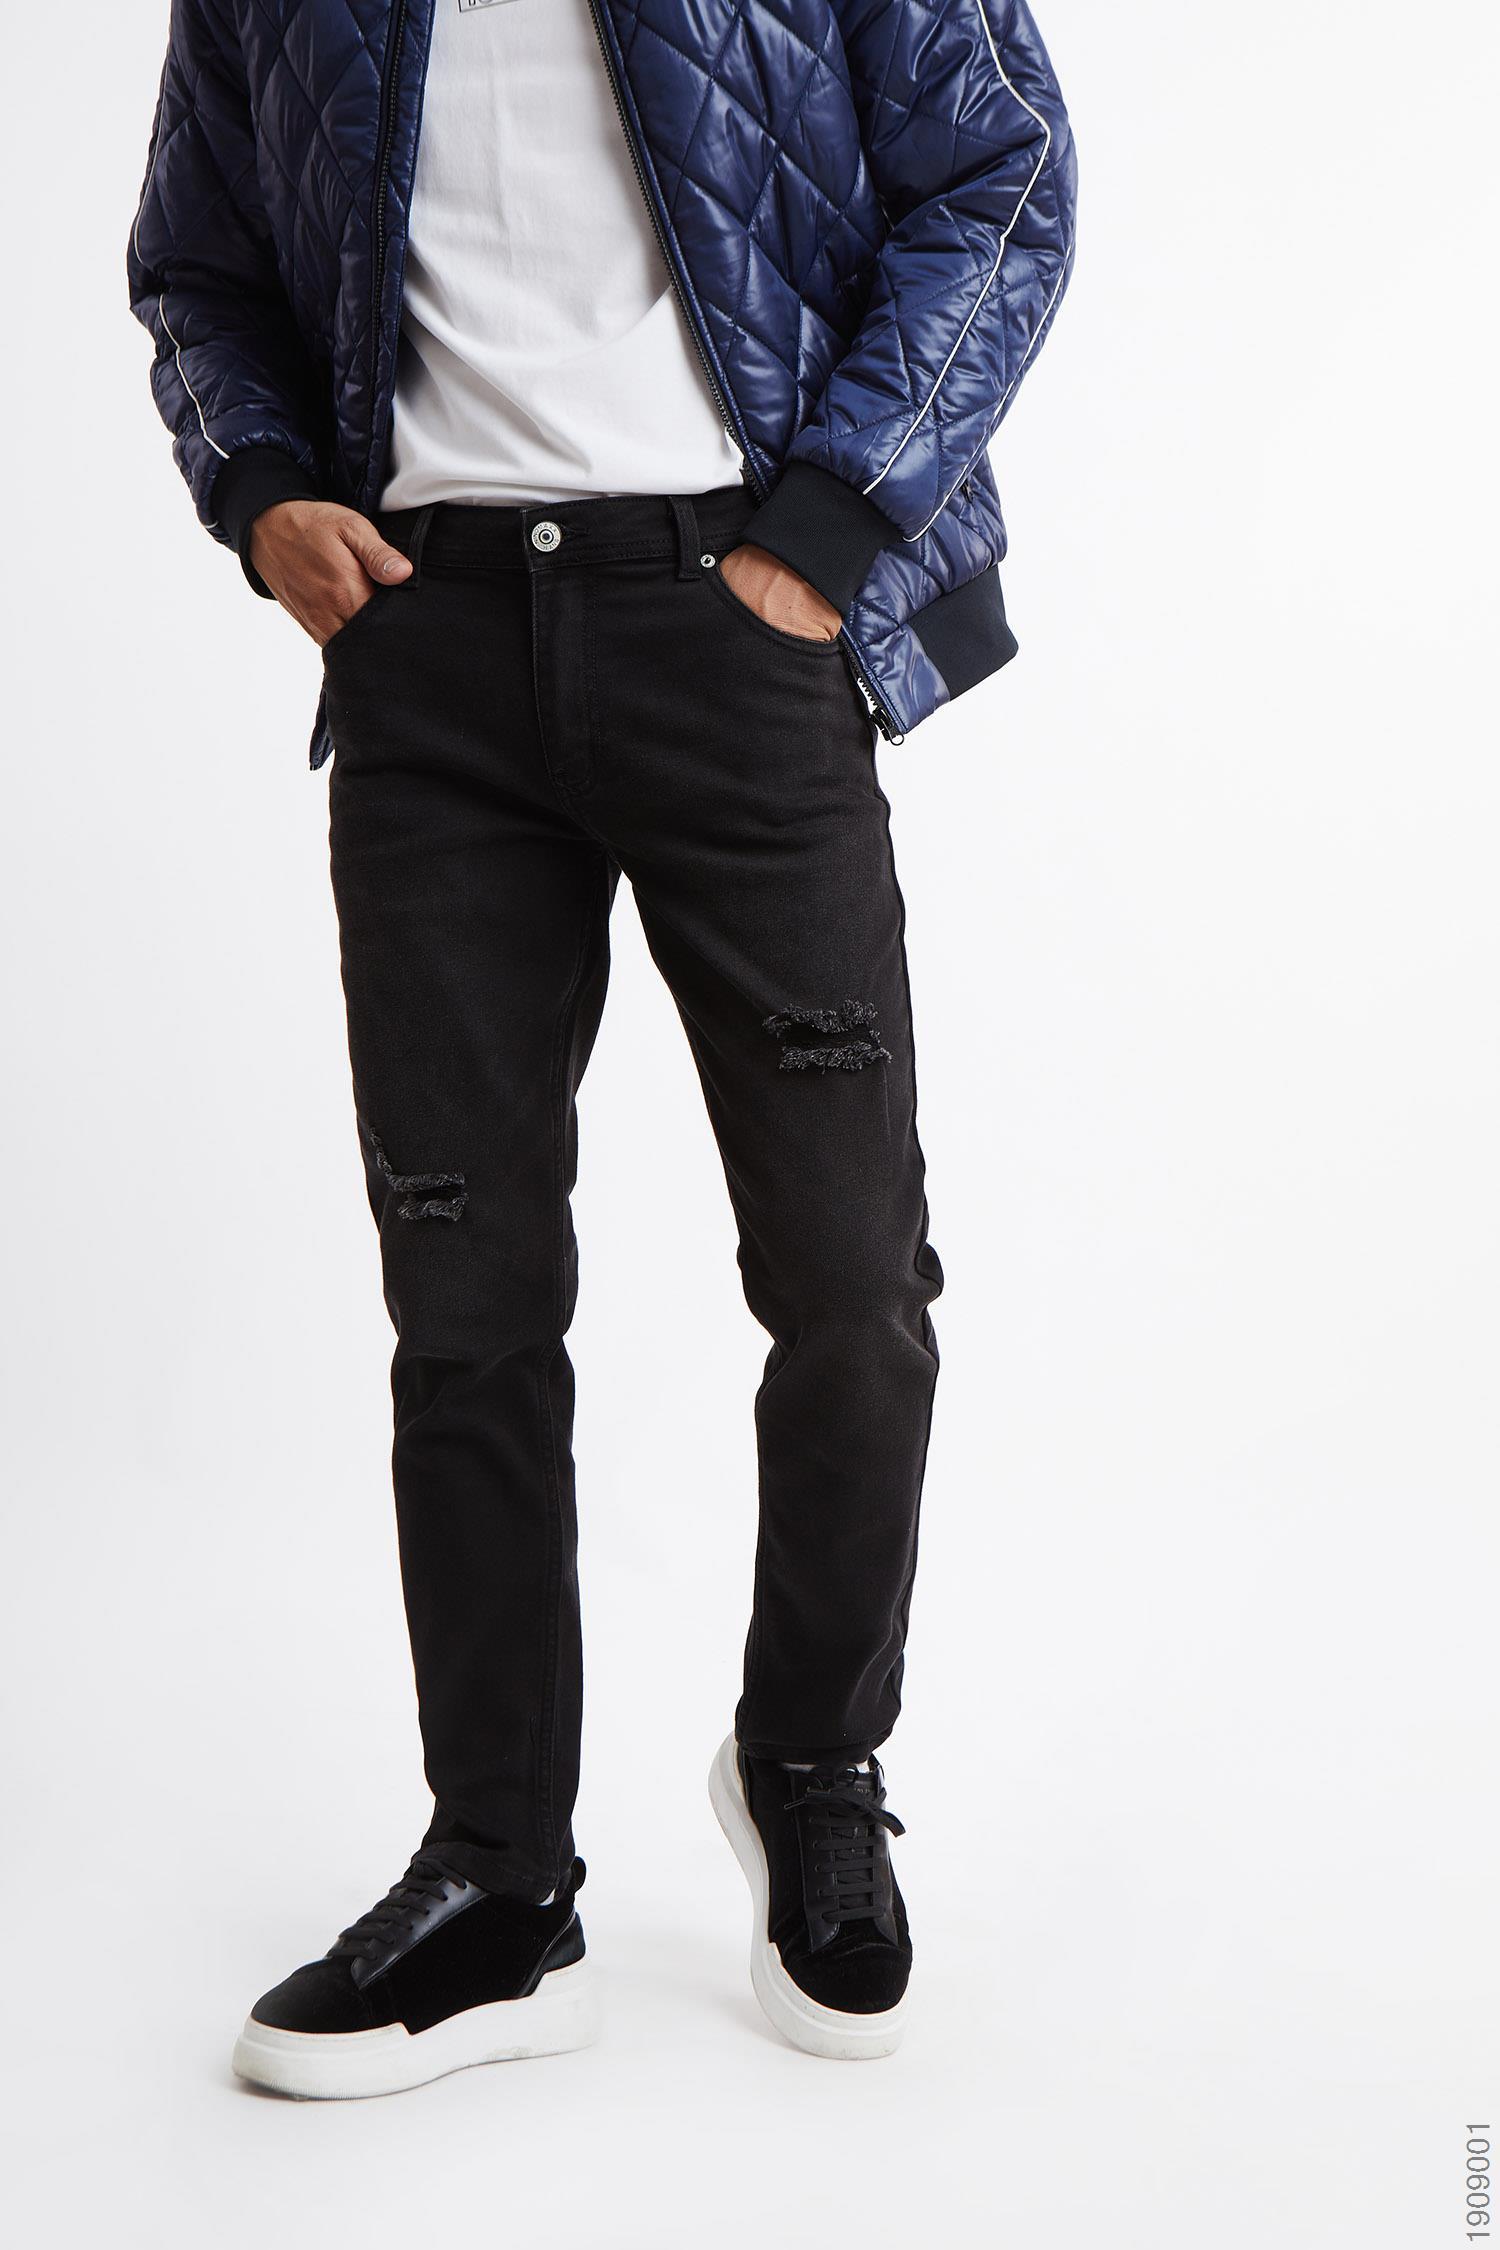 quần jean nam - 1909001